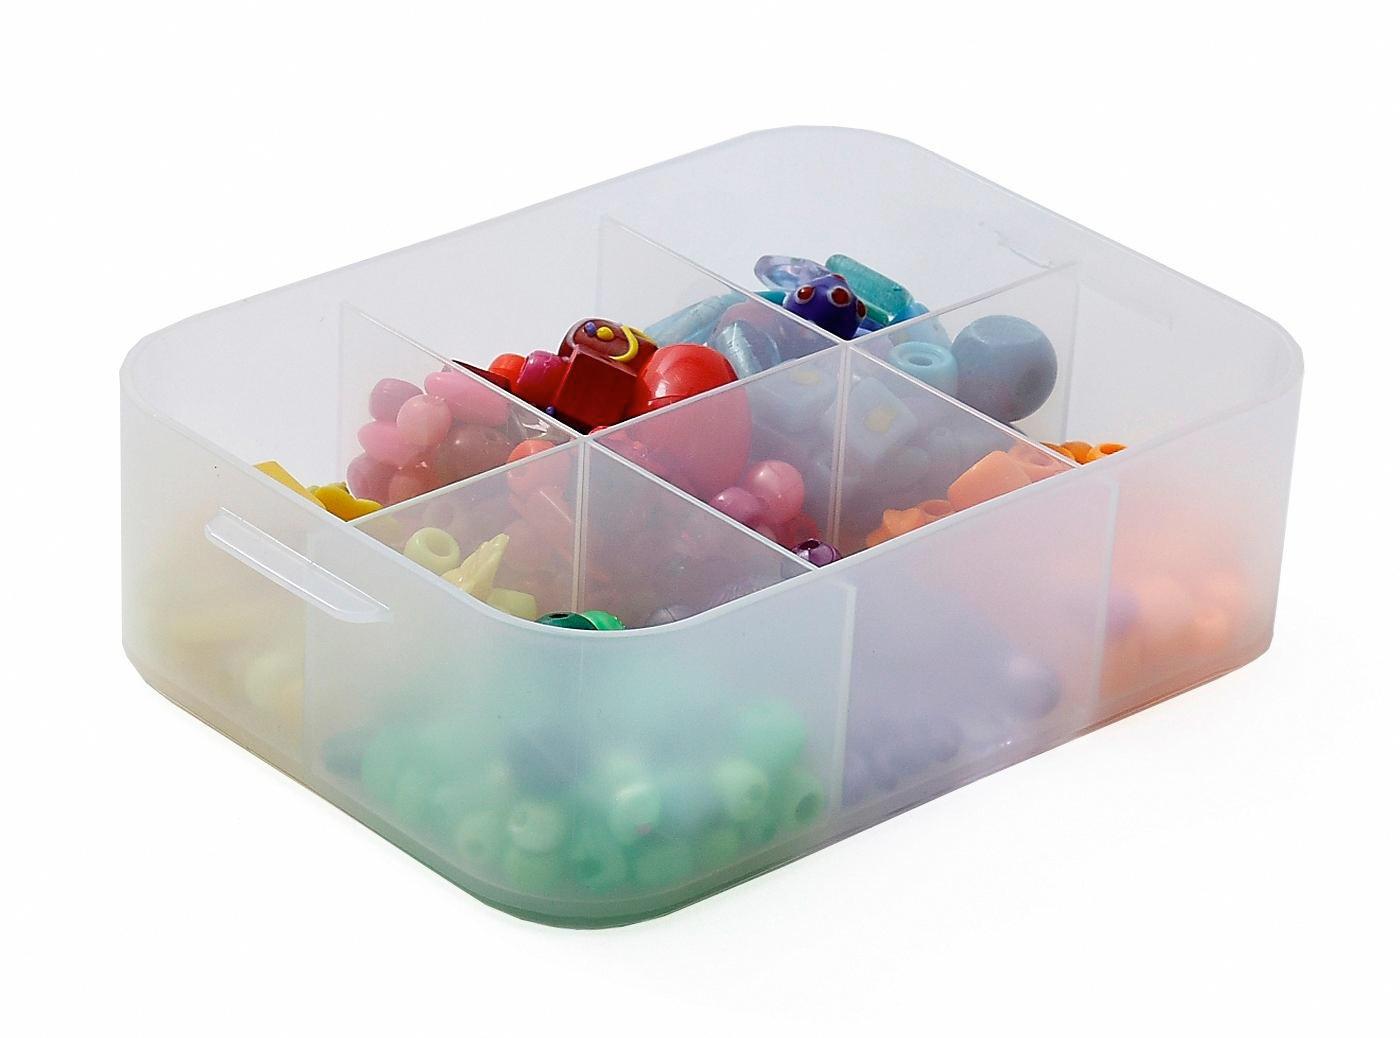 BOX Kunststoff Naturfarben - Naturfarben, Kunststoff (16,7/11,5/4,7cm)